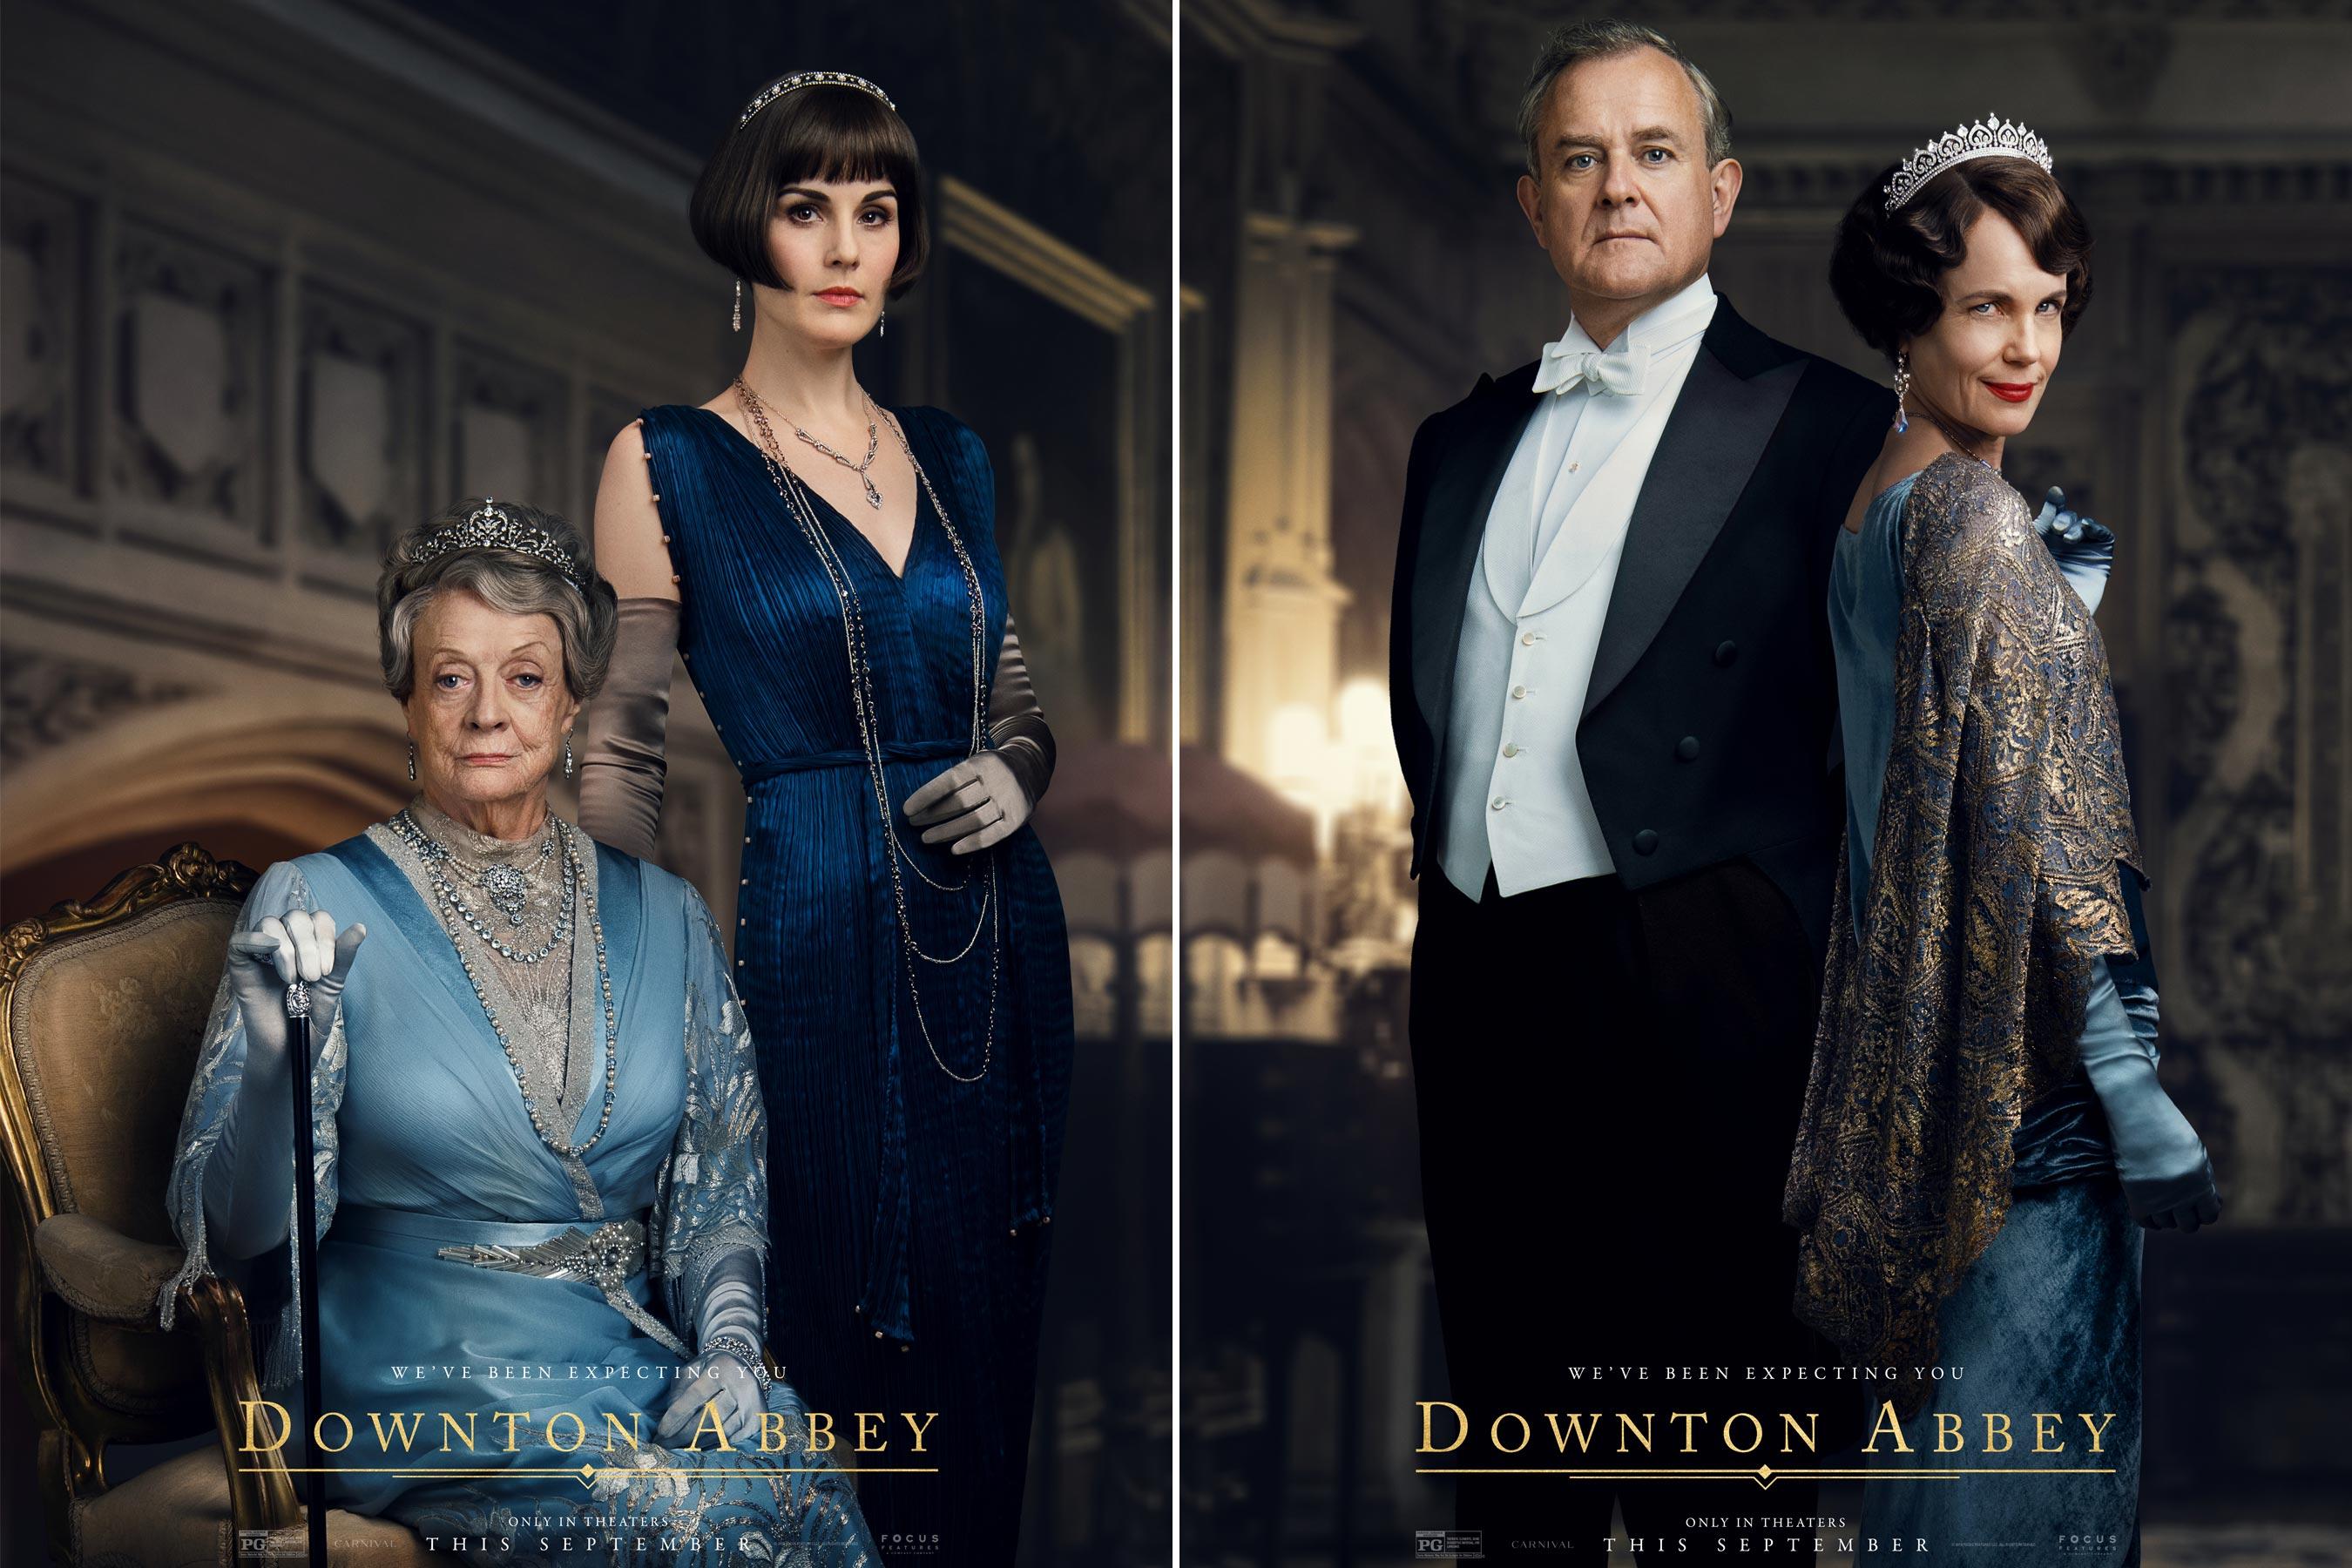 upcoming films - dawntom abbey